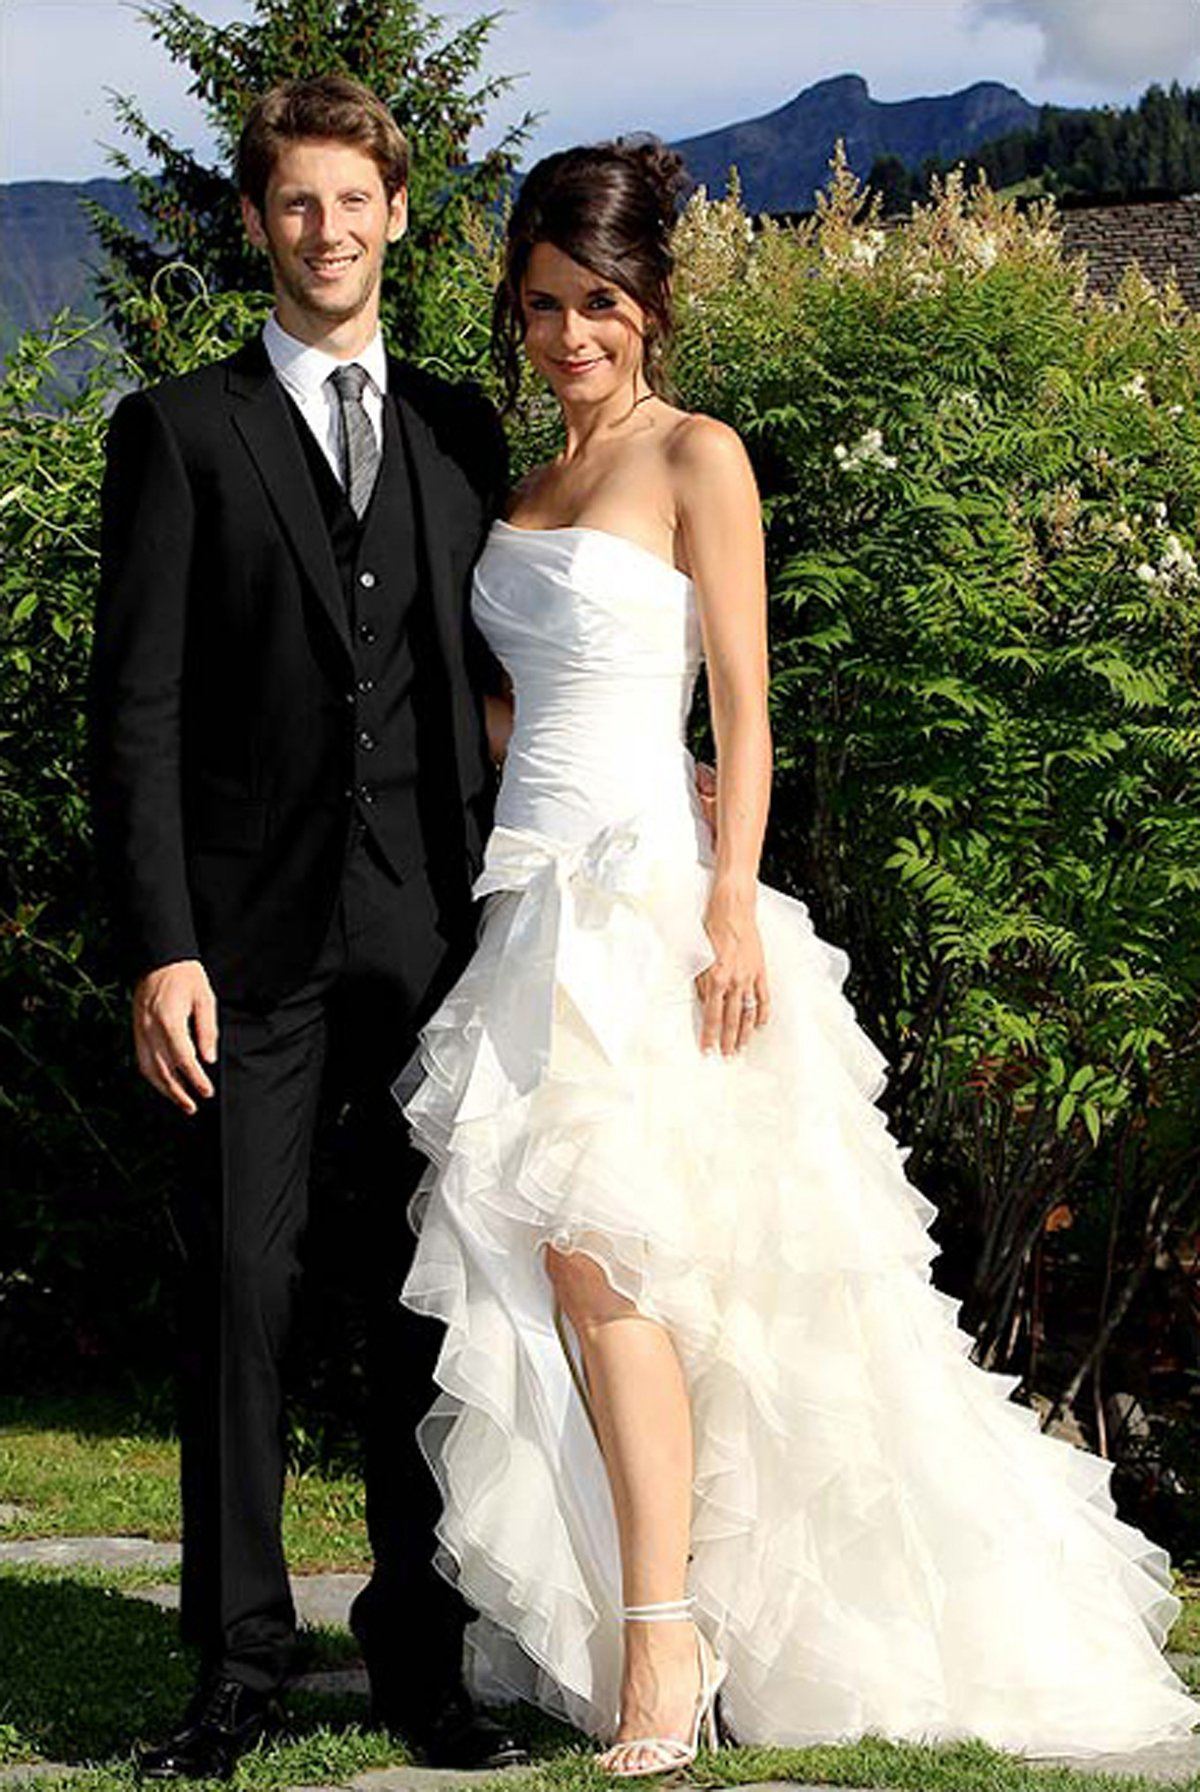 Jolles Marion and Romain Grosjean